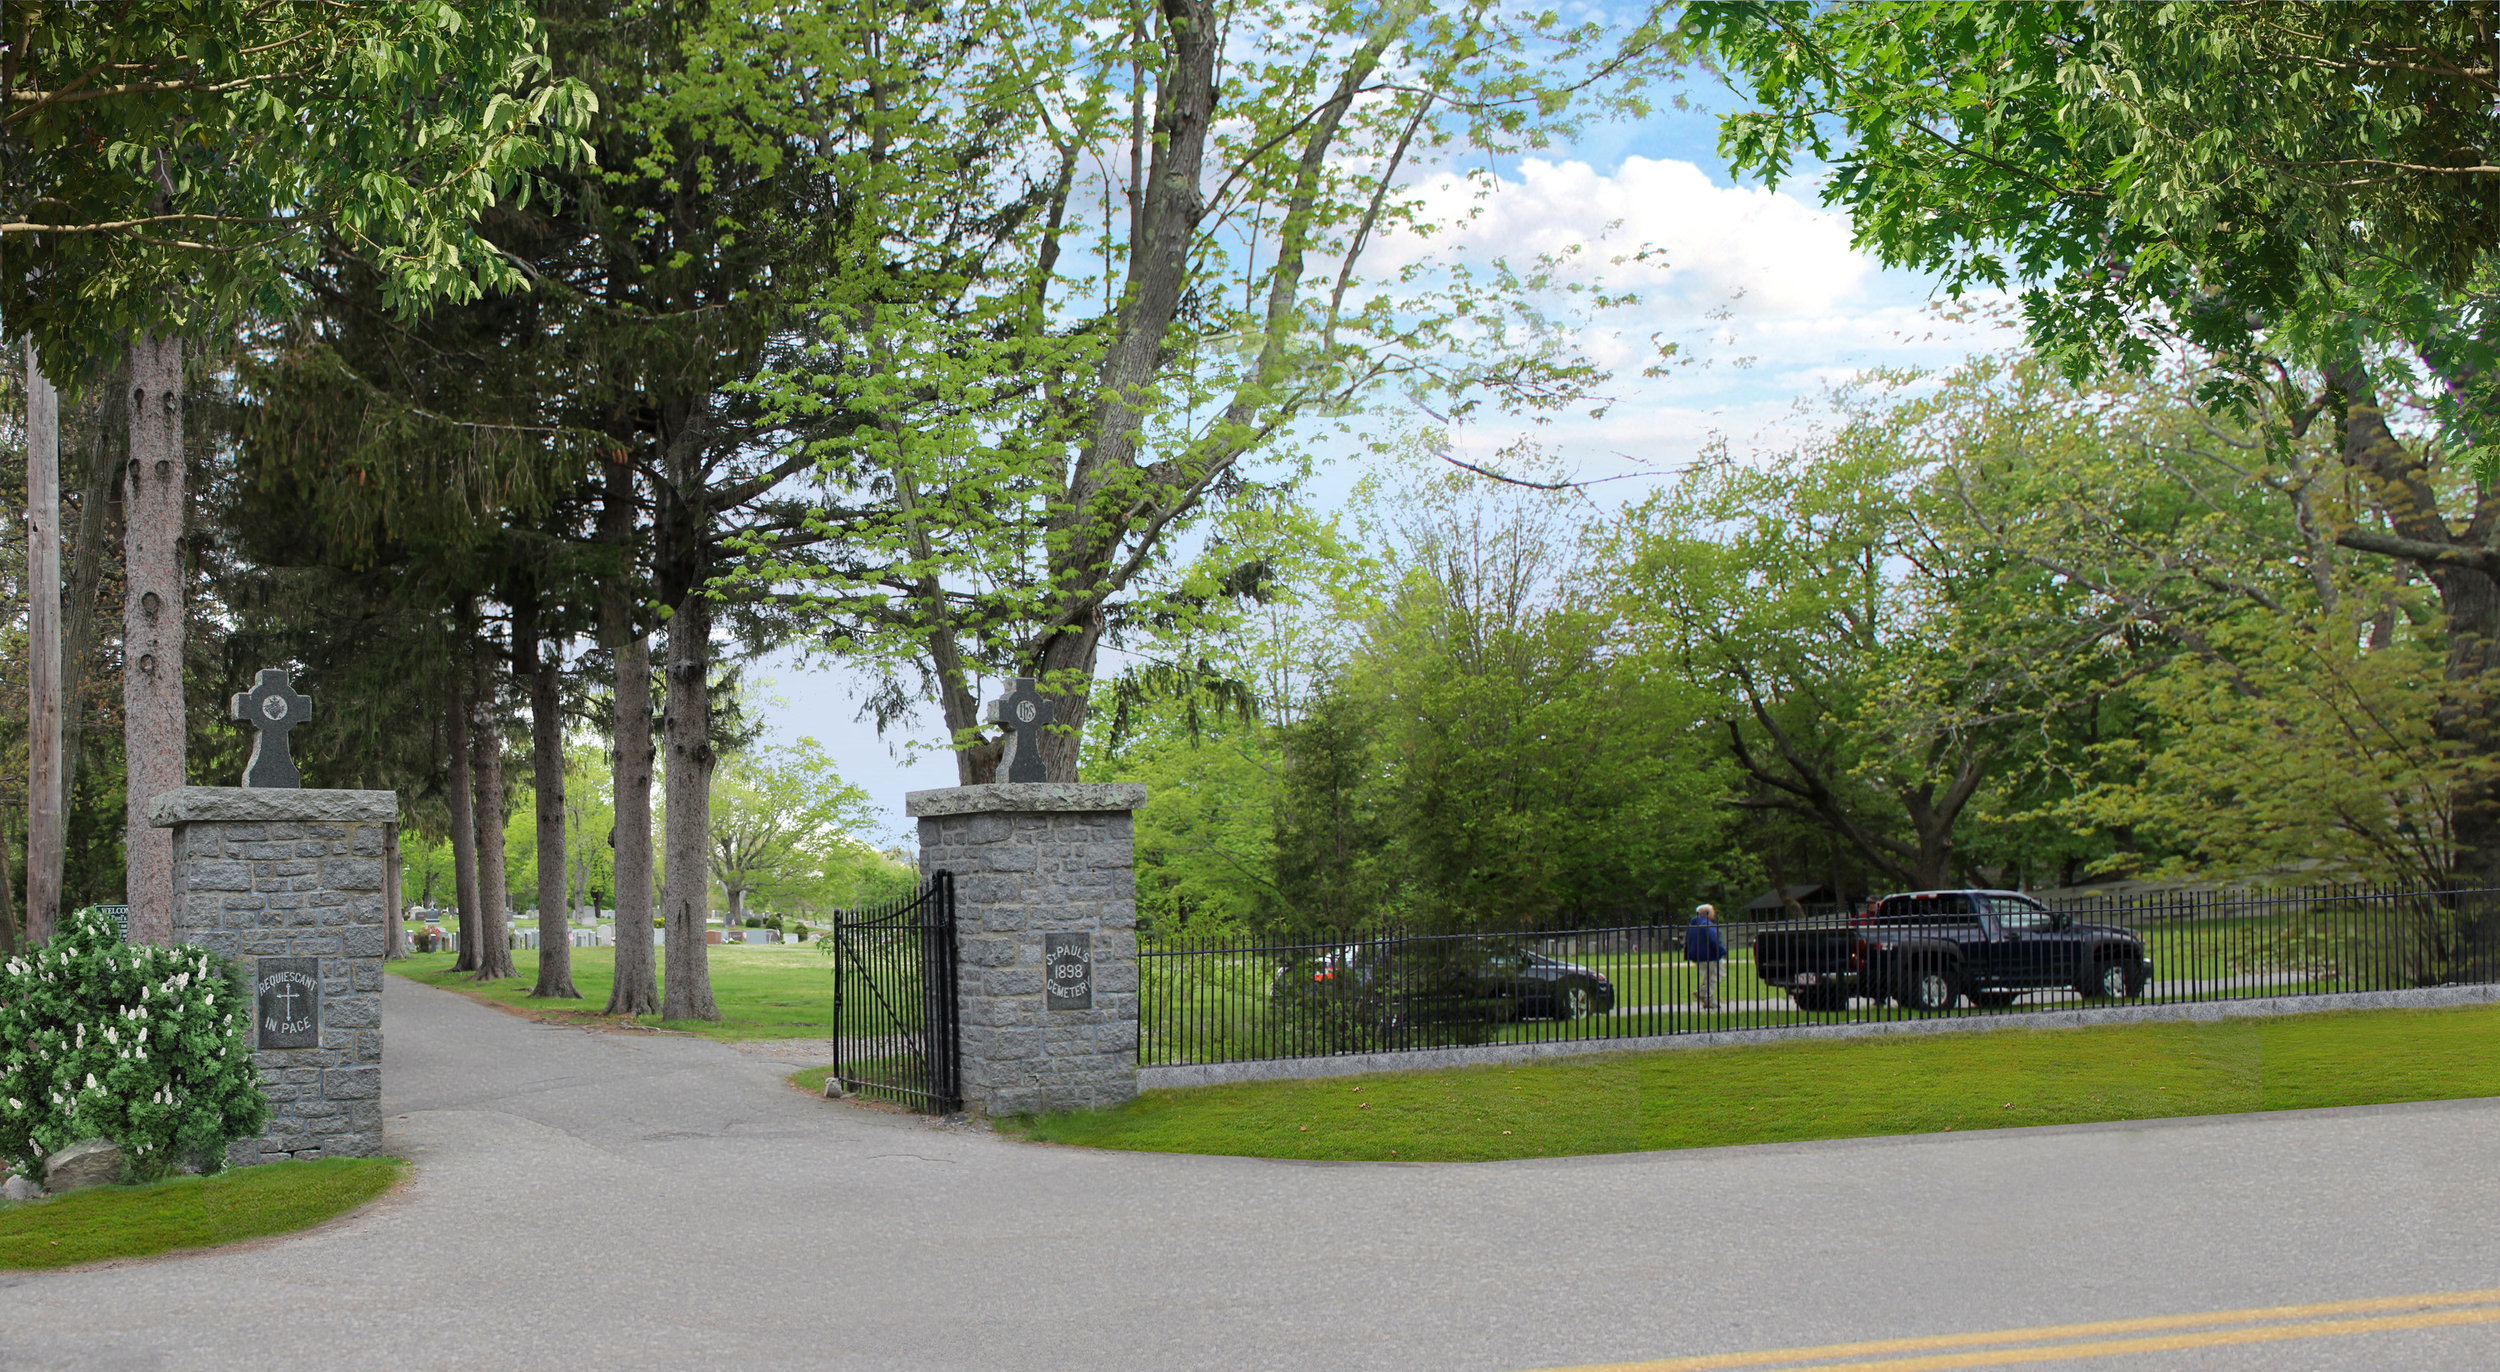 St. Paul's Parish Cemetery Rendering by Halvorson Design